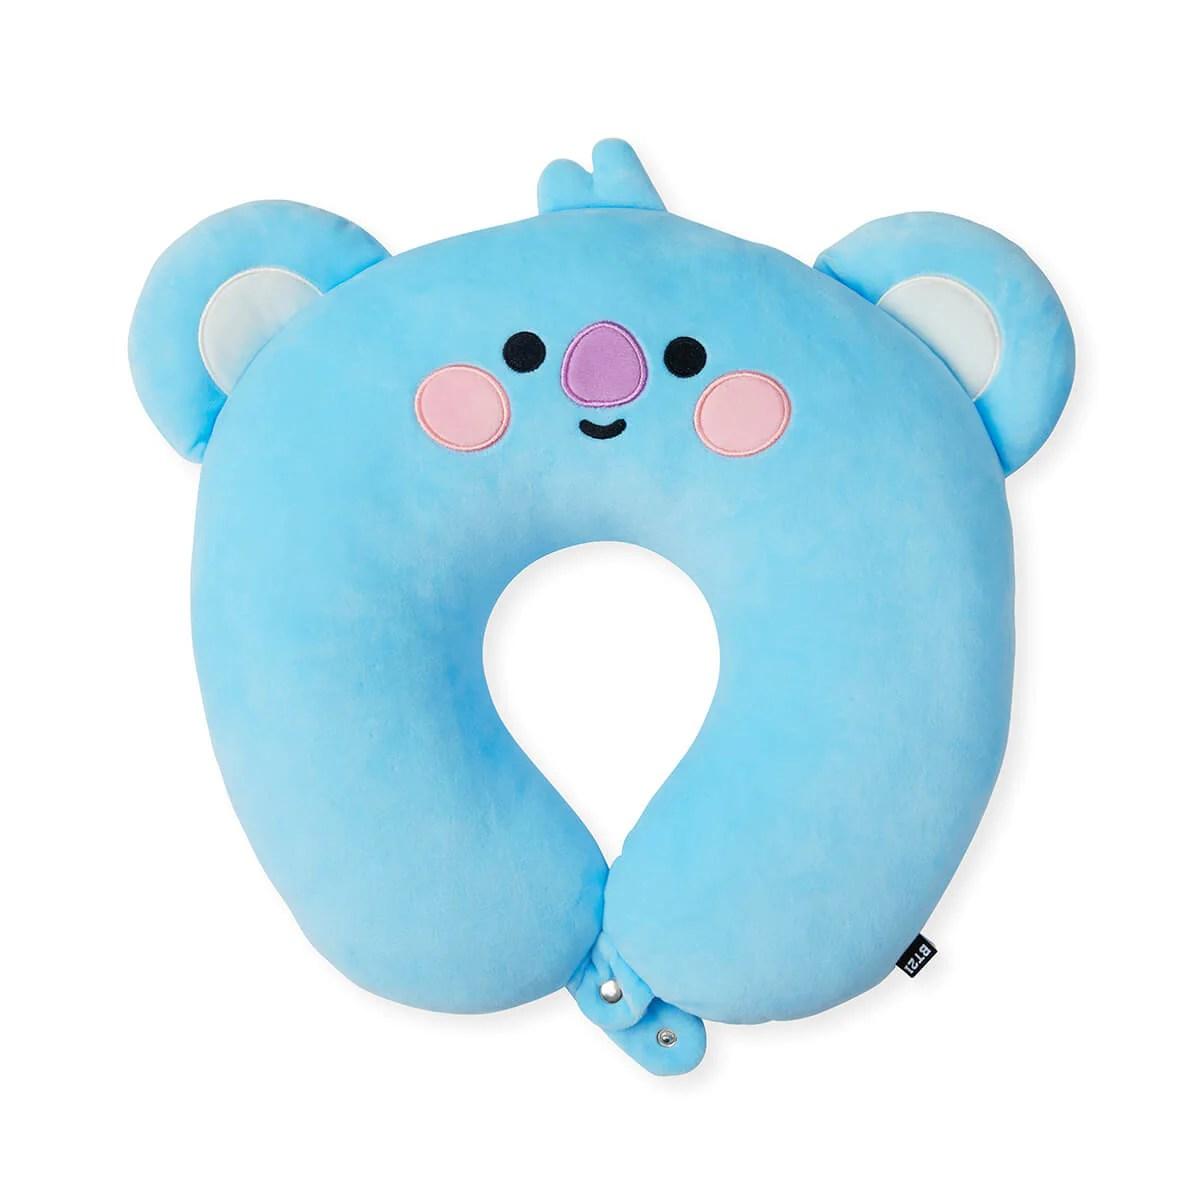 bt21 koya baby travel neck pillow w snap fastener